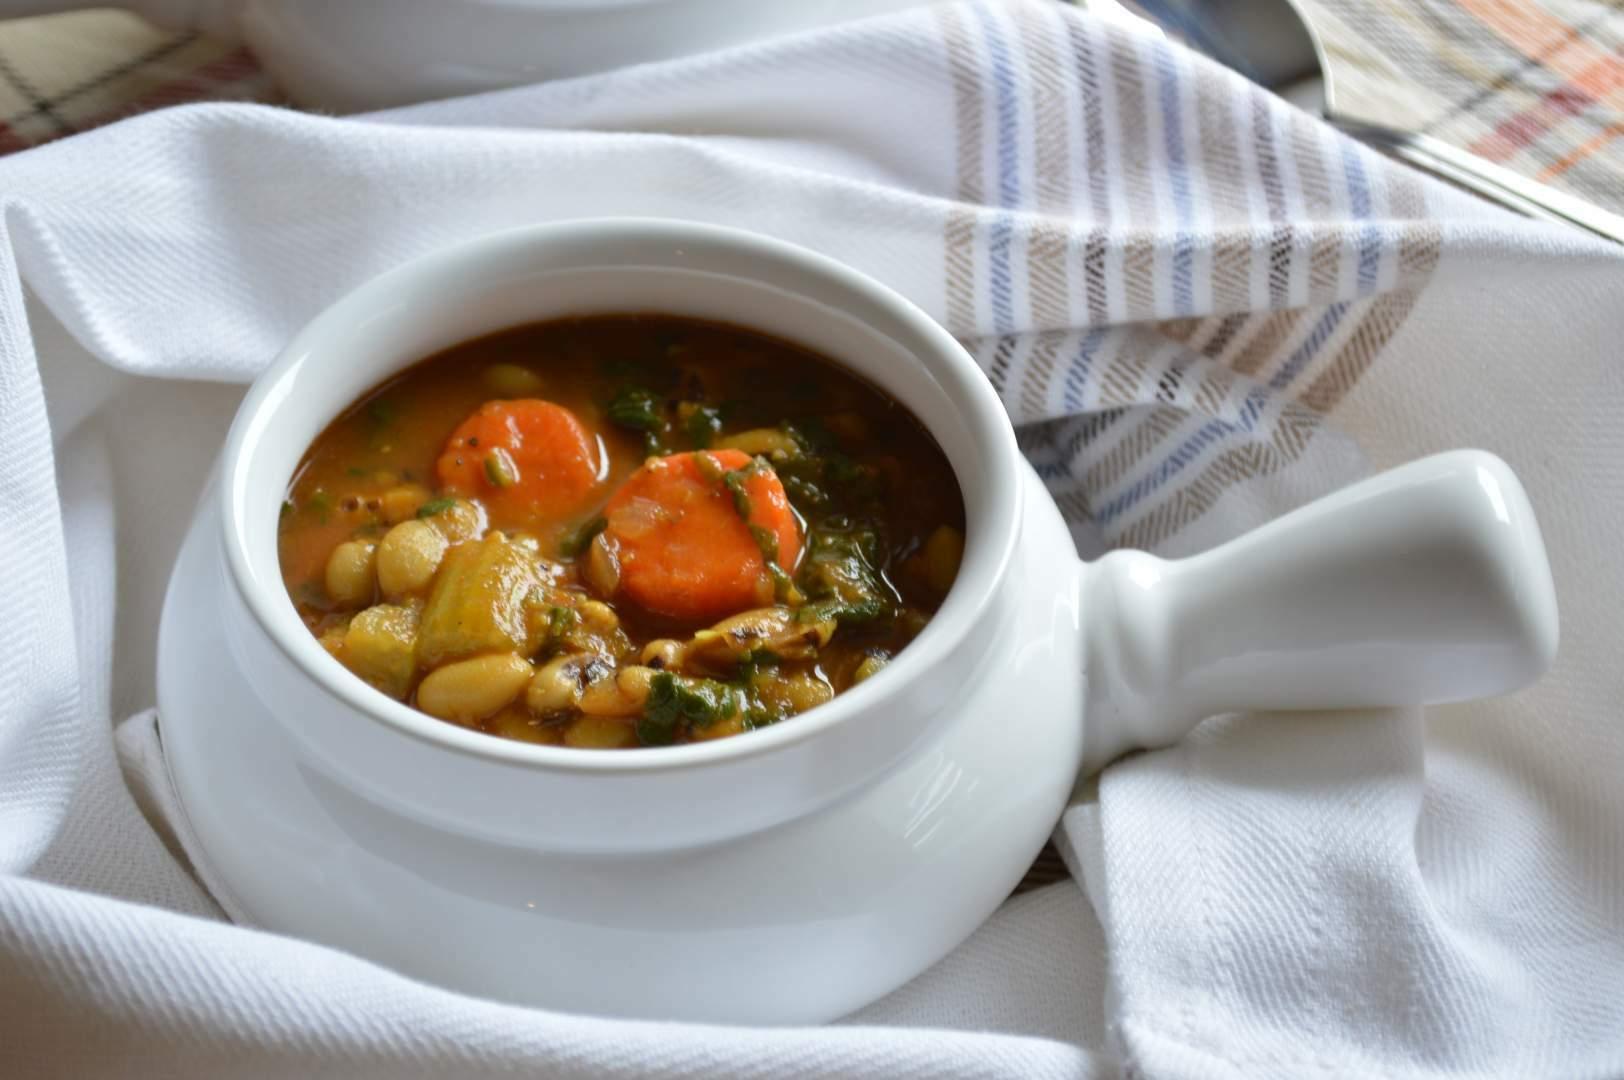 Vegetable Stew At Room Temperature